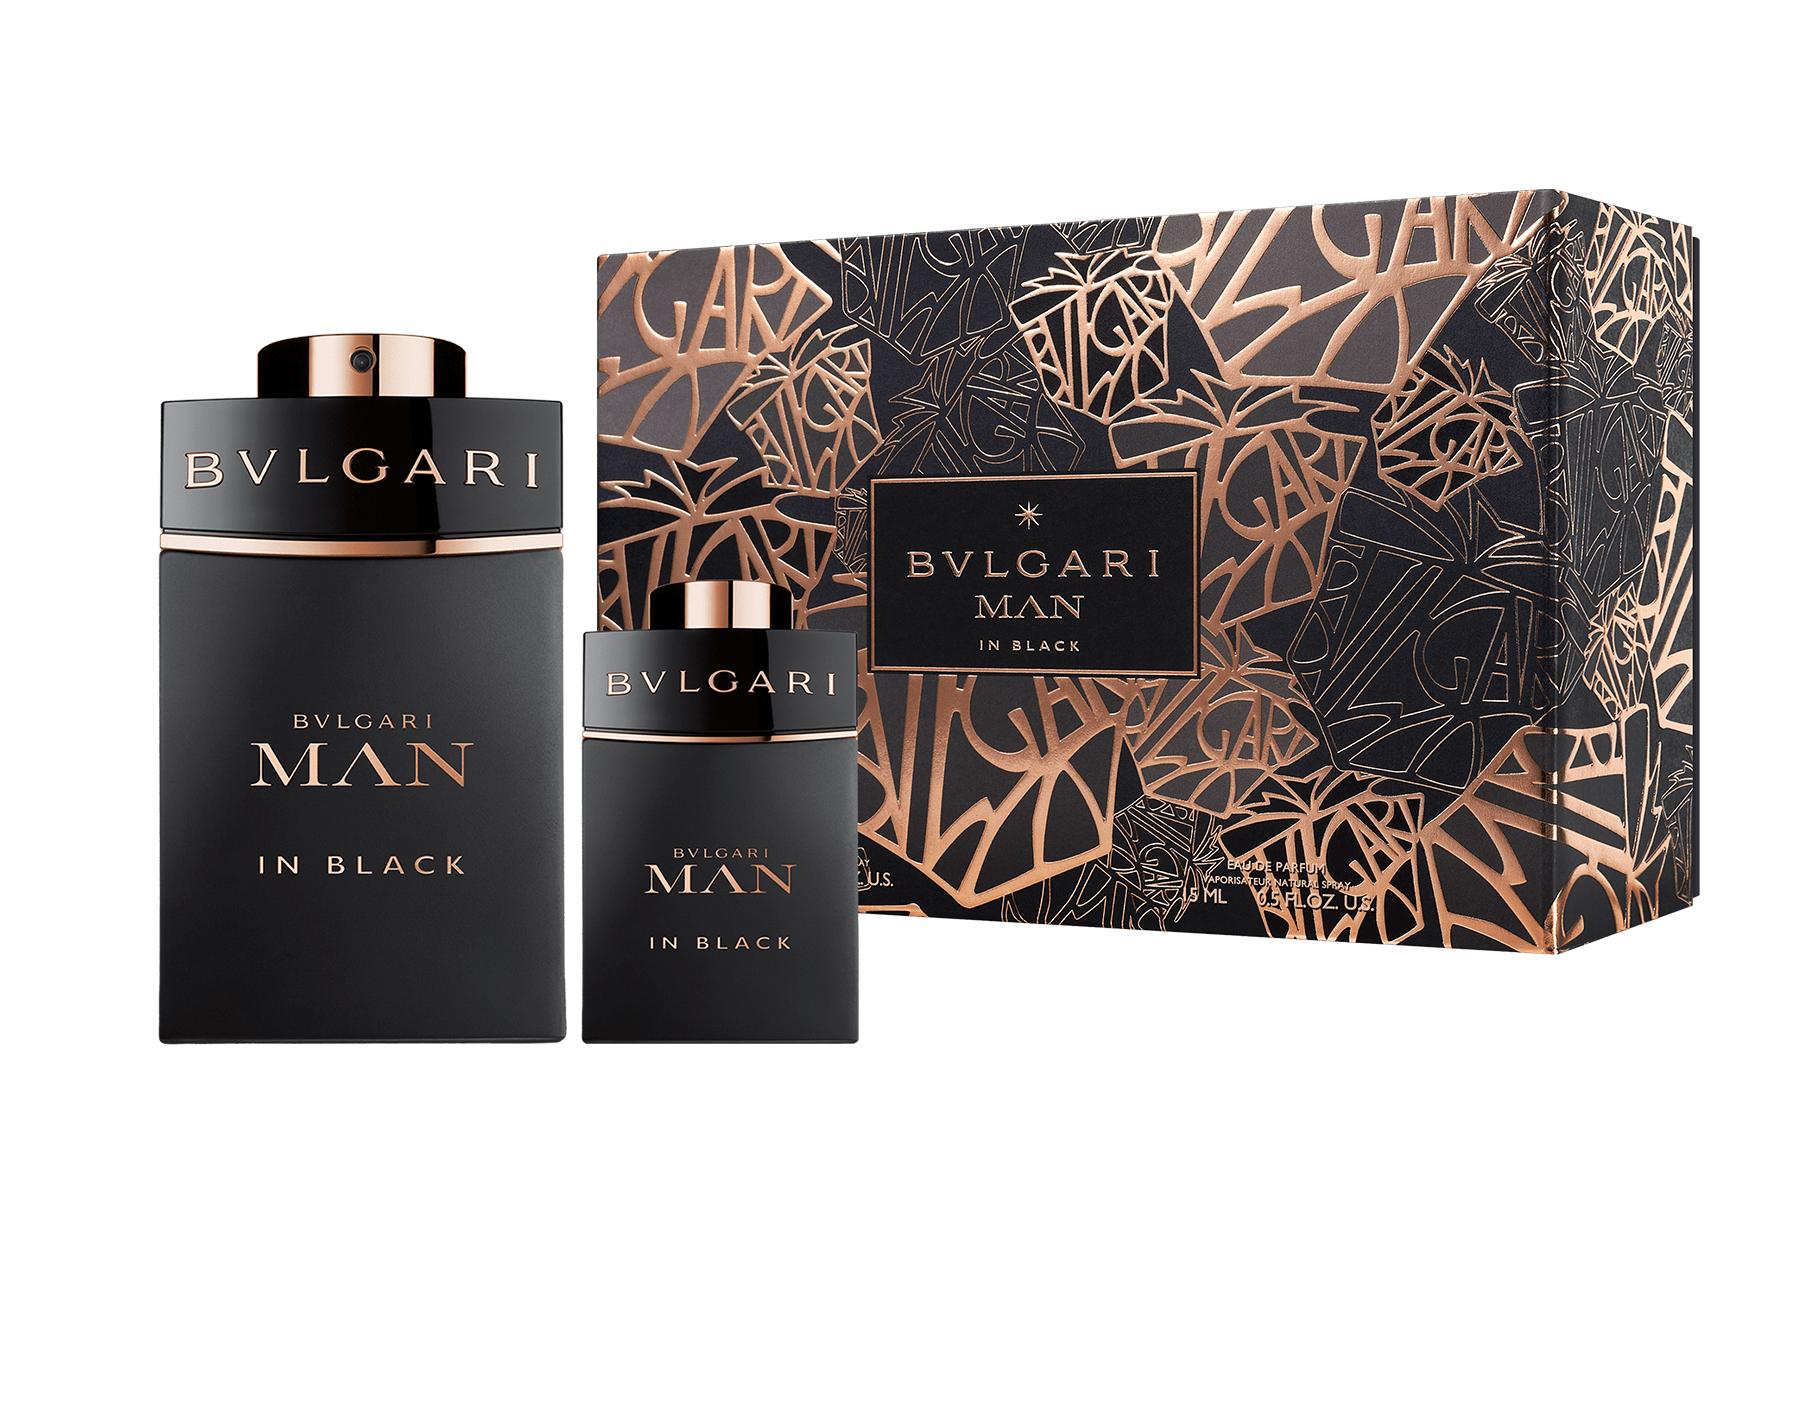 Eau de Parfum Bvlgari Man 100ml +Eau de Parfum Bvlgari Man 15ml 40456 image 1